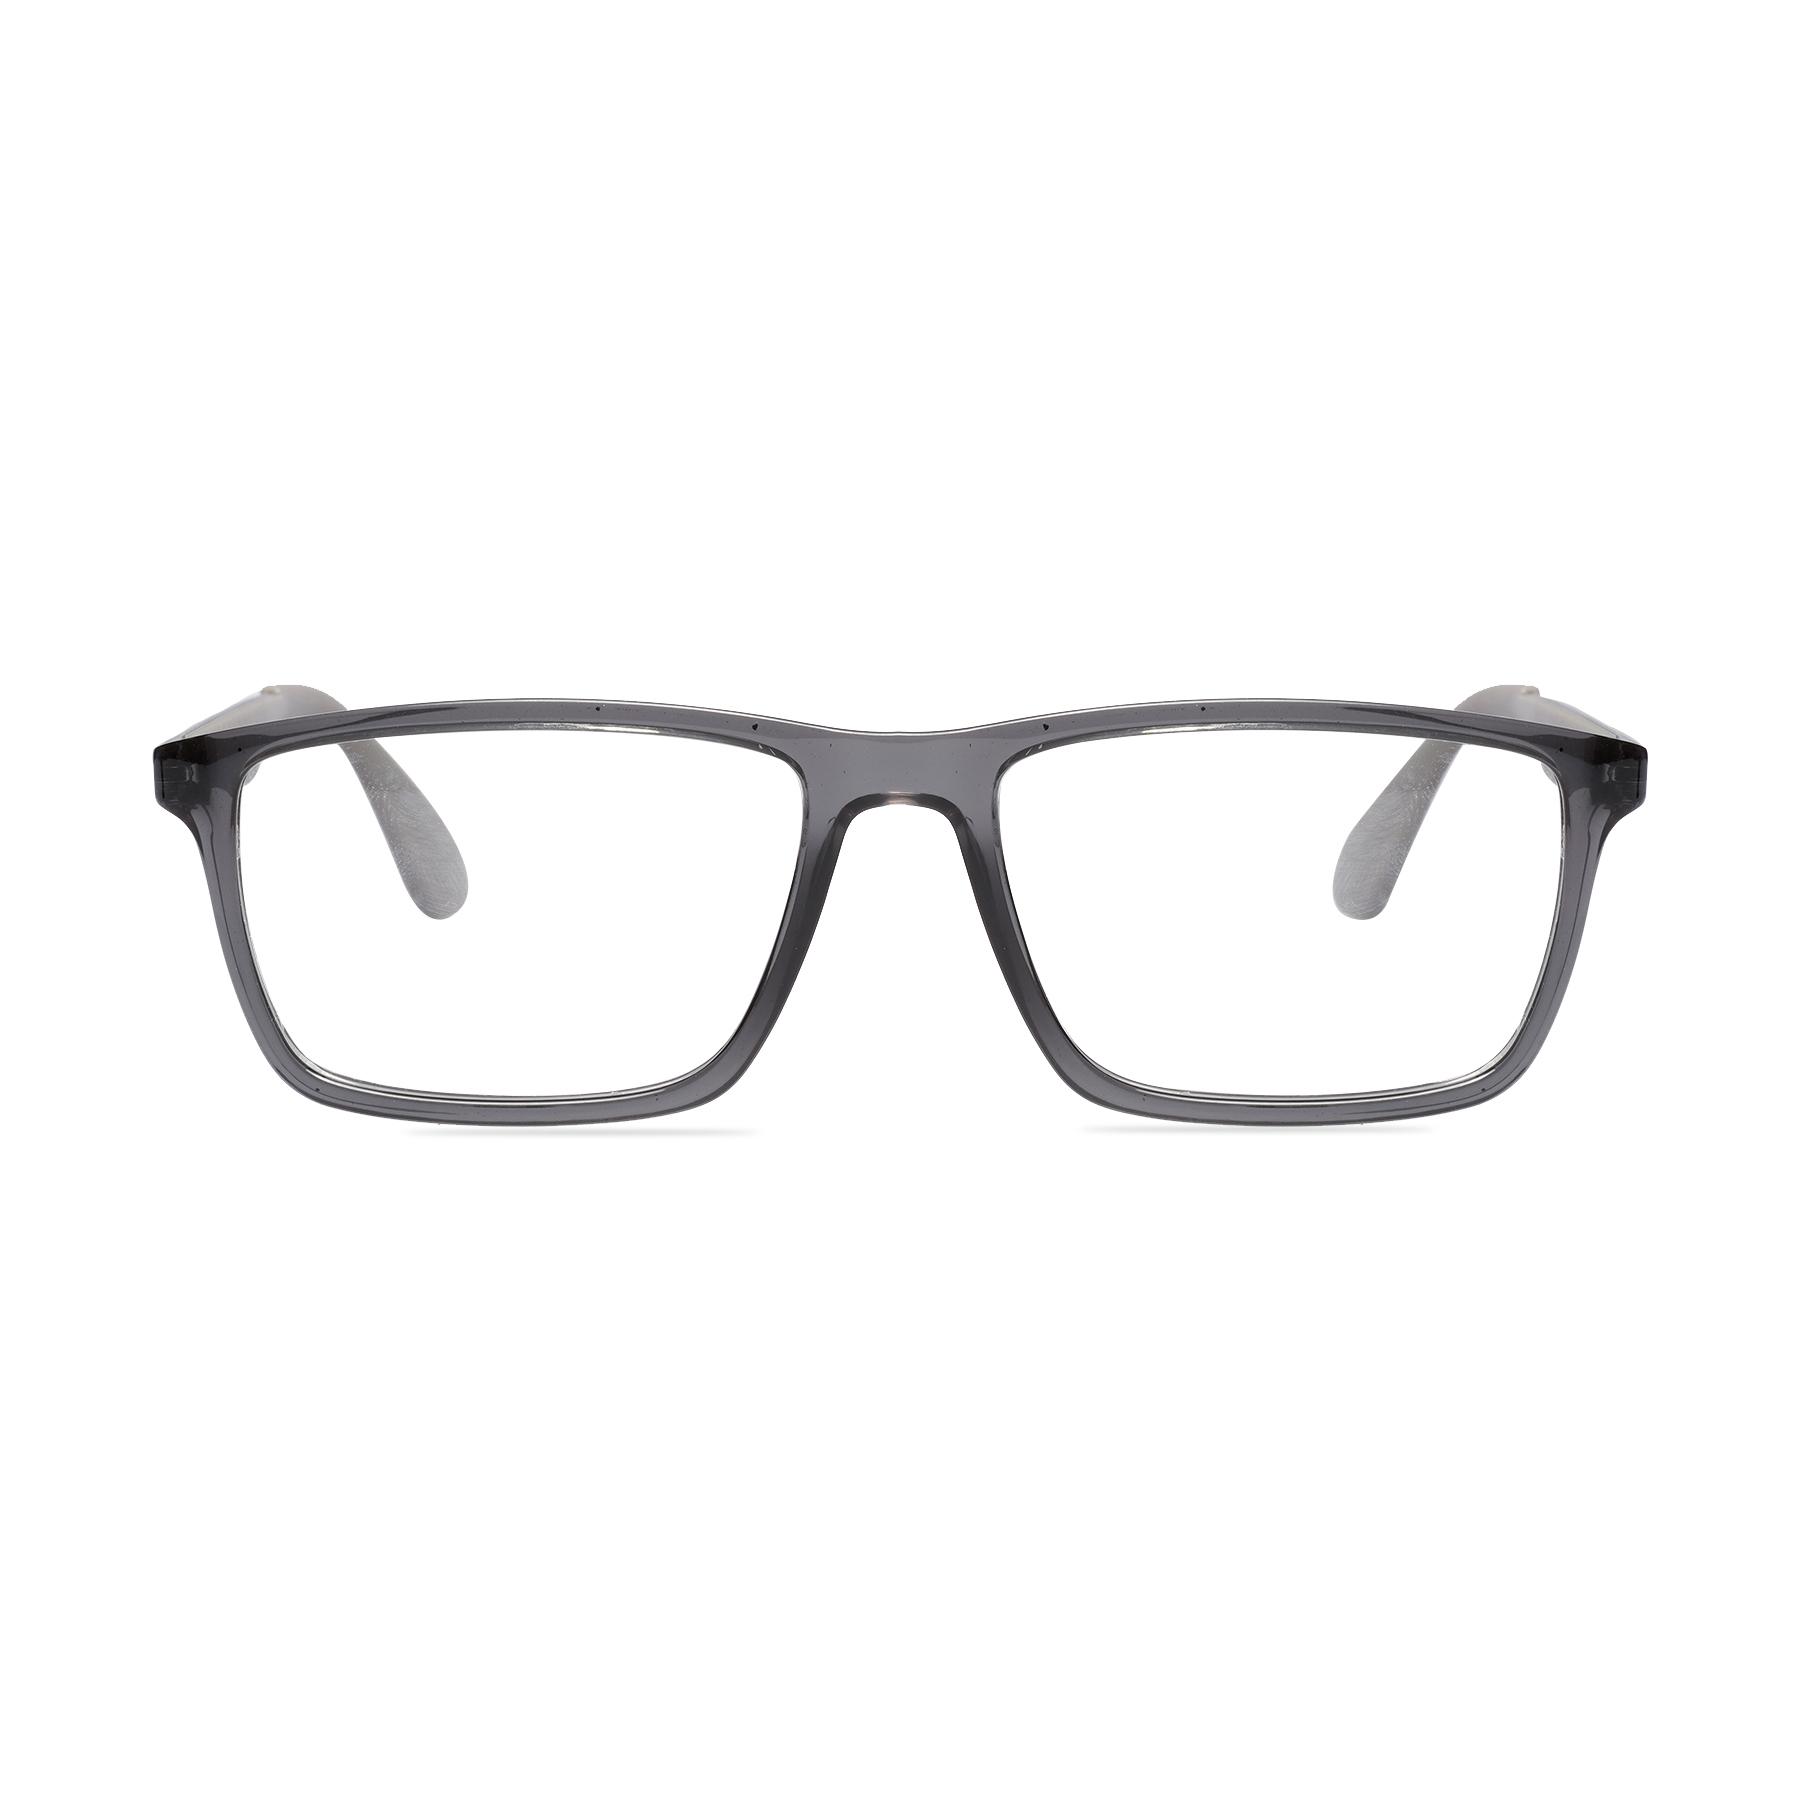 Vinaldi Plus VP002 Optical Frames